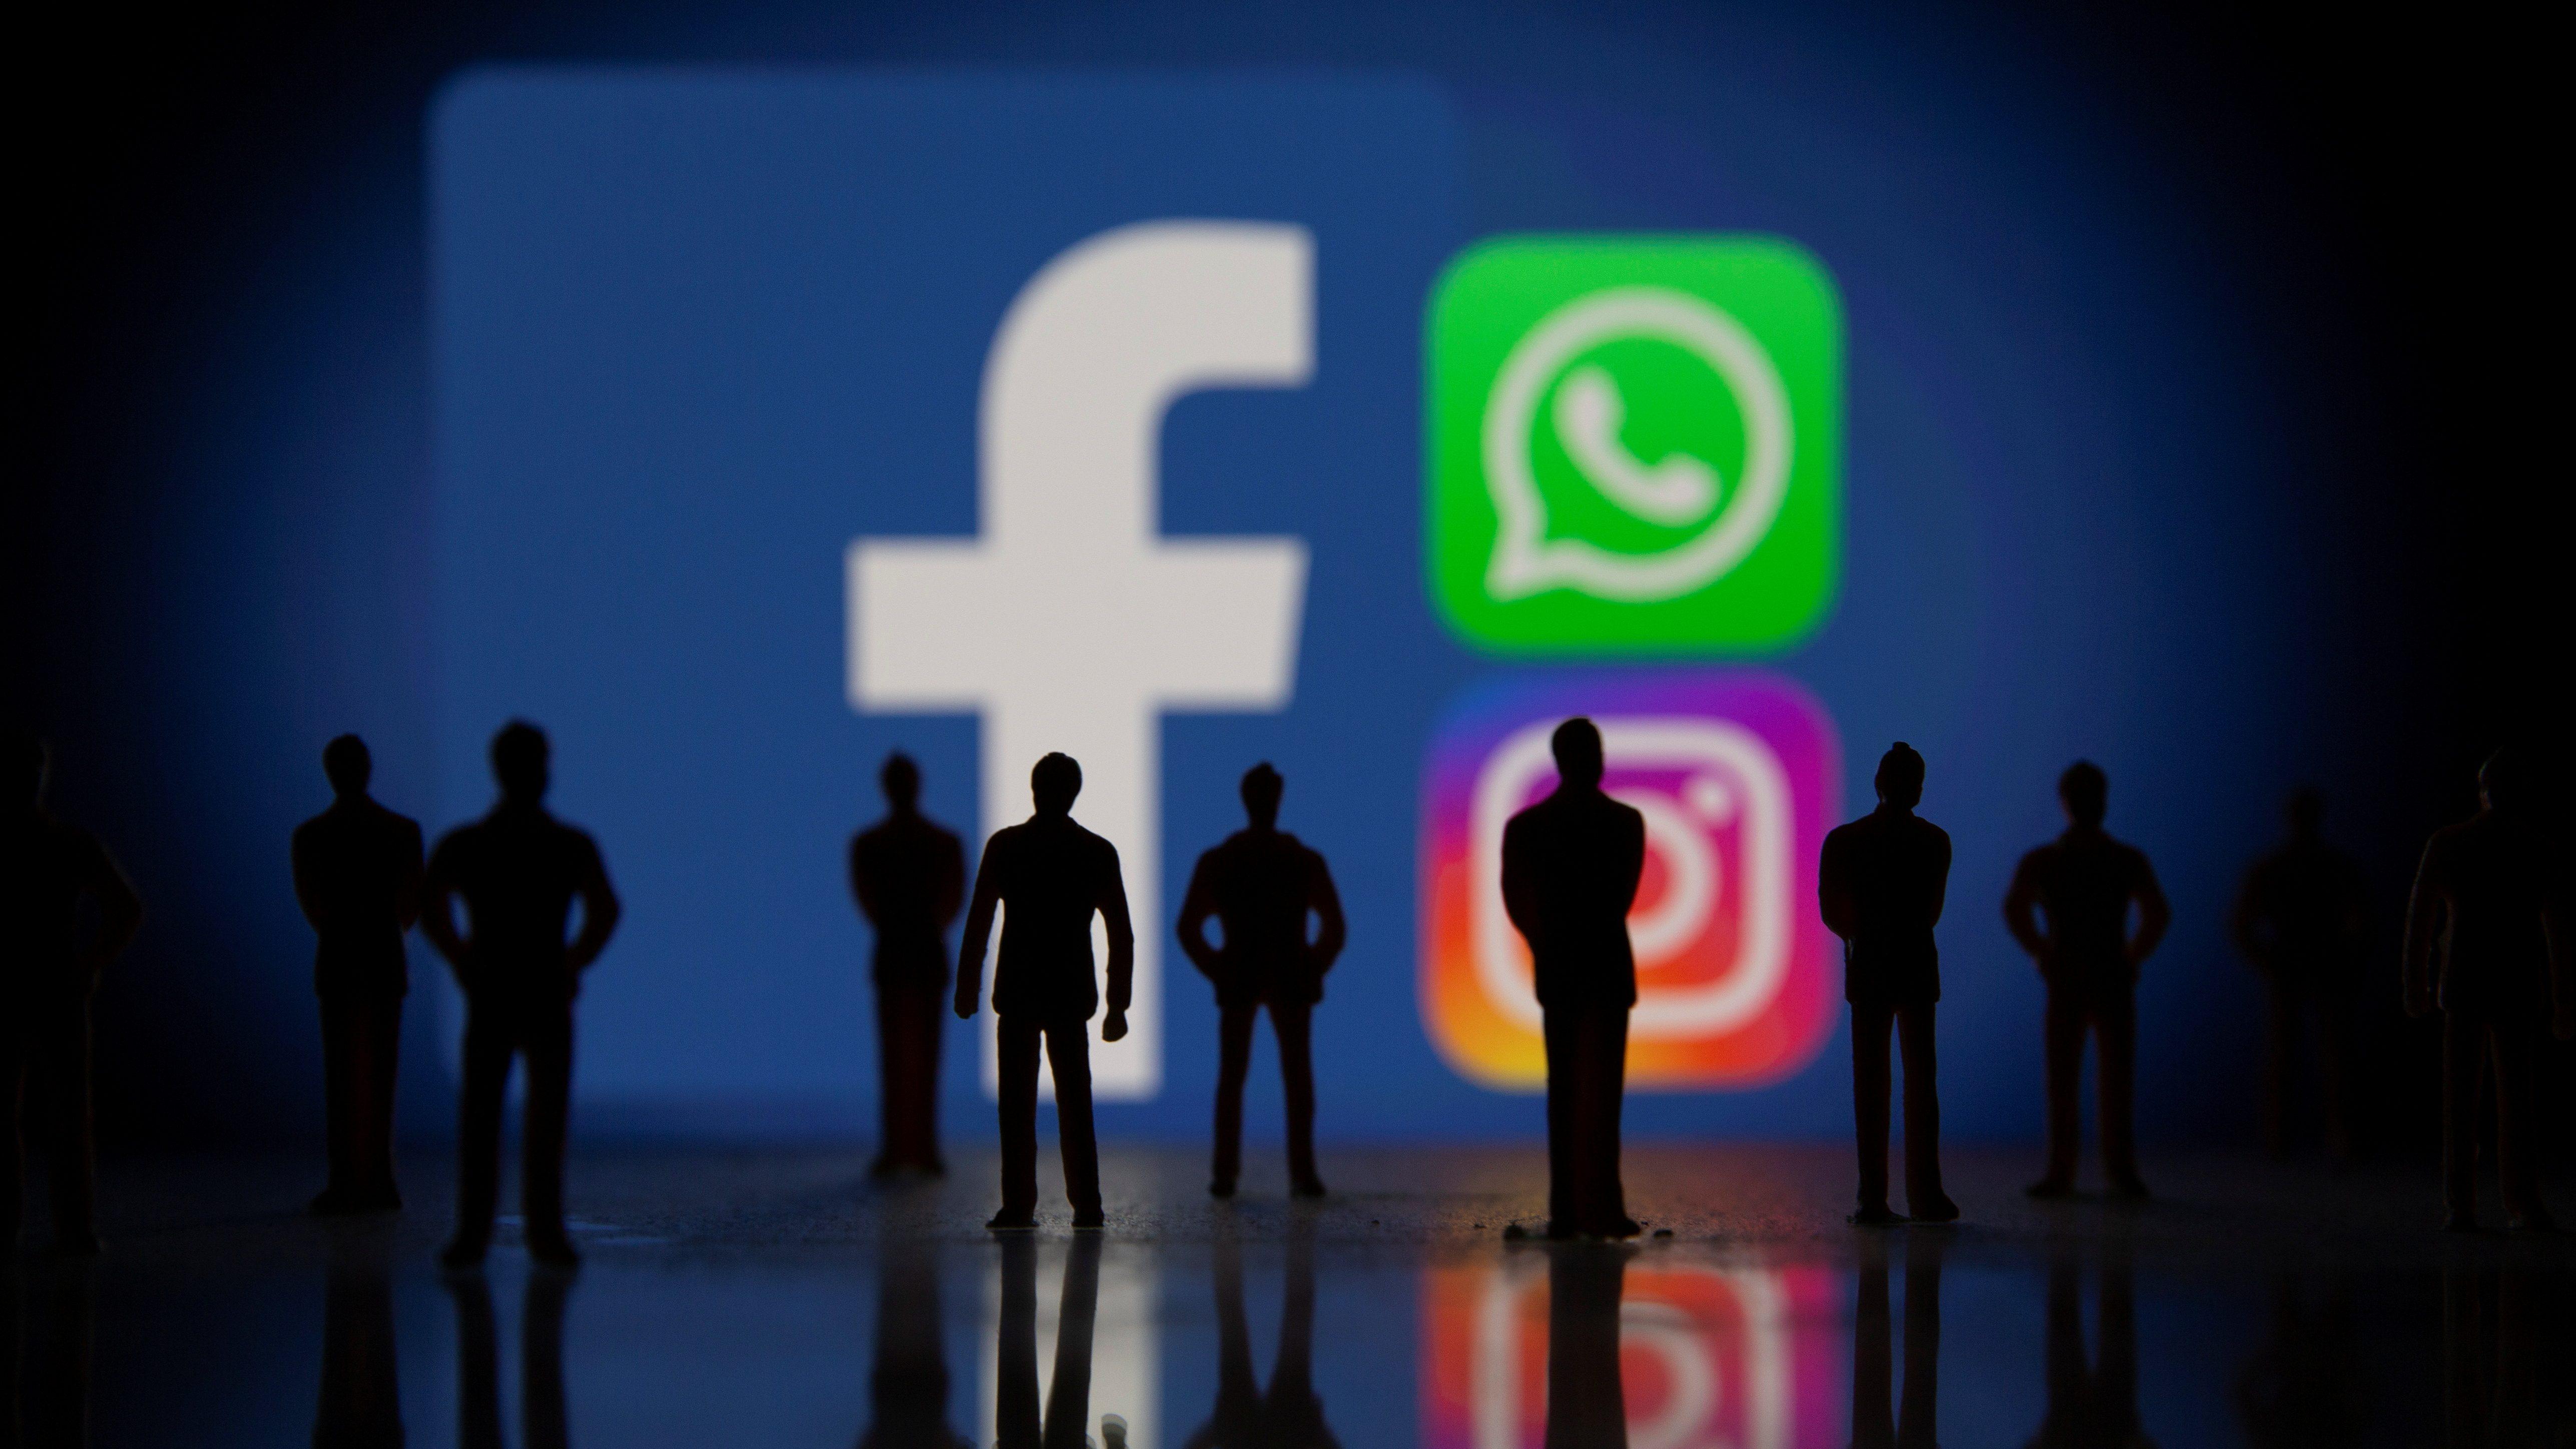 Facebook, Whatsapp and Instagram logos.